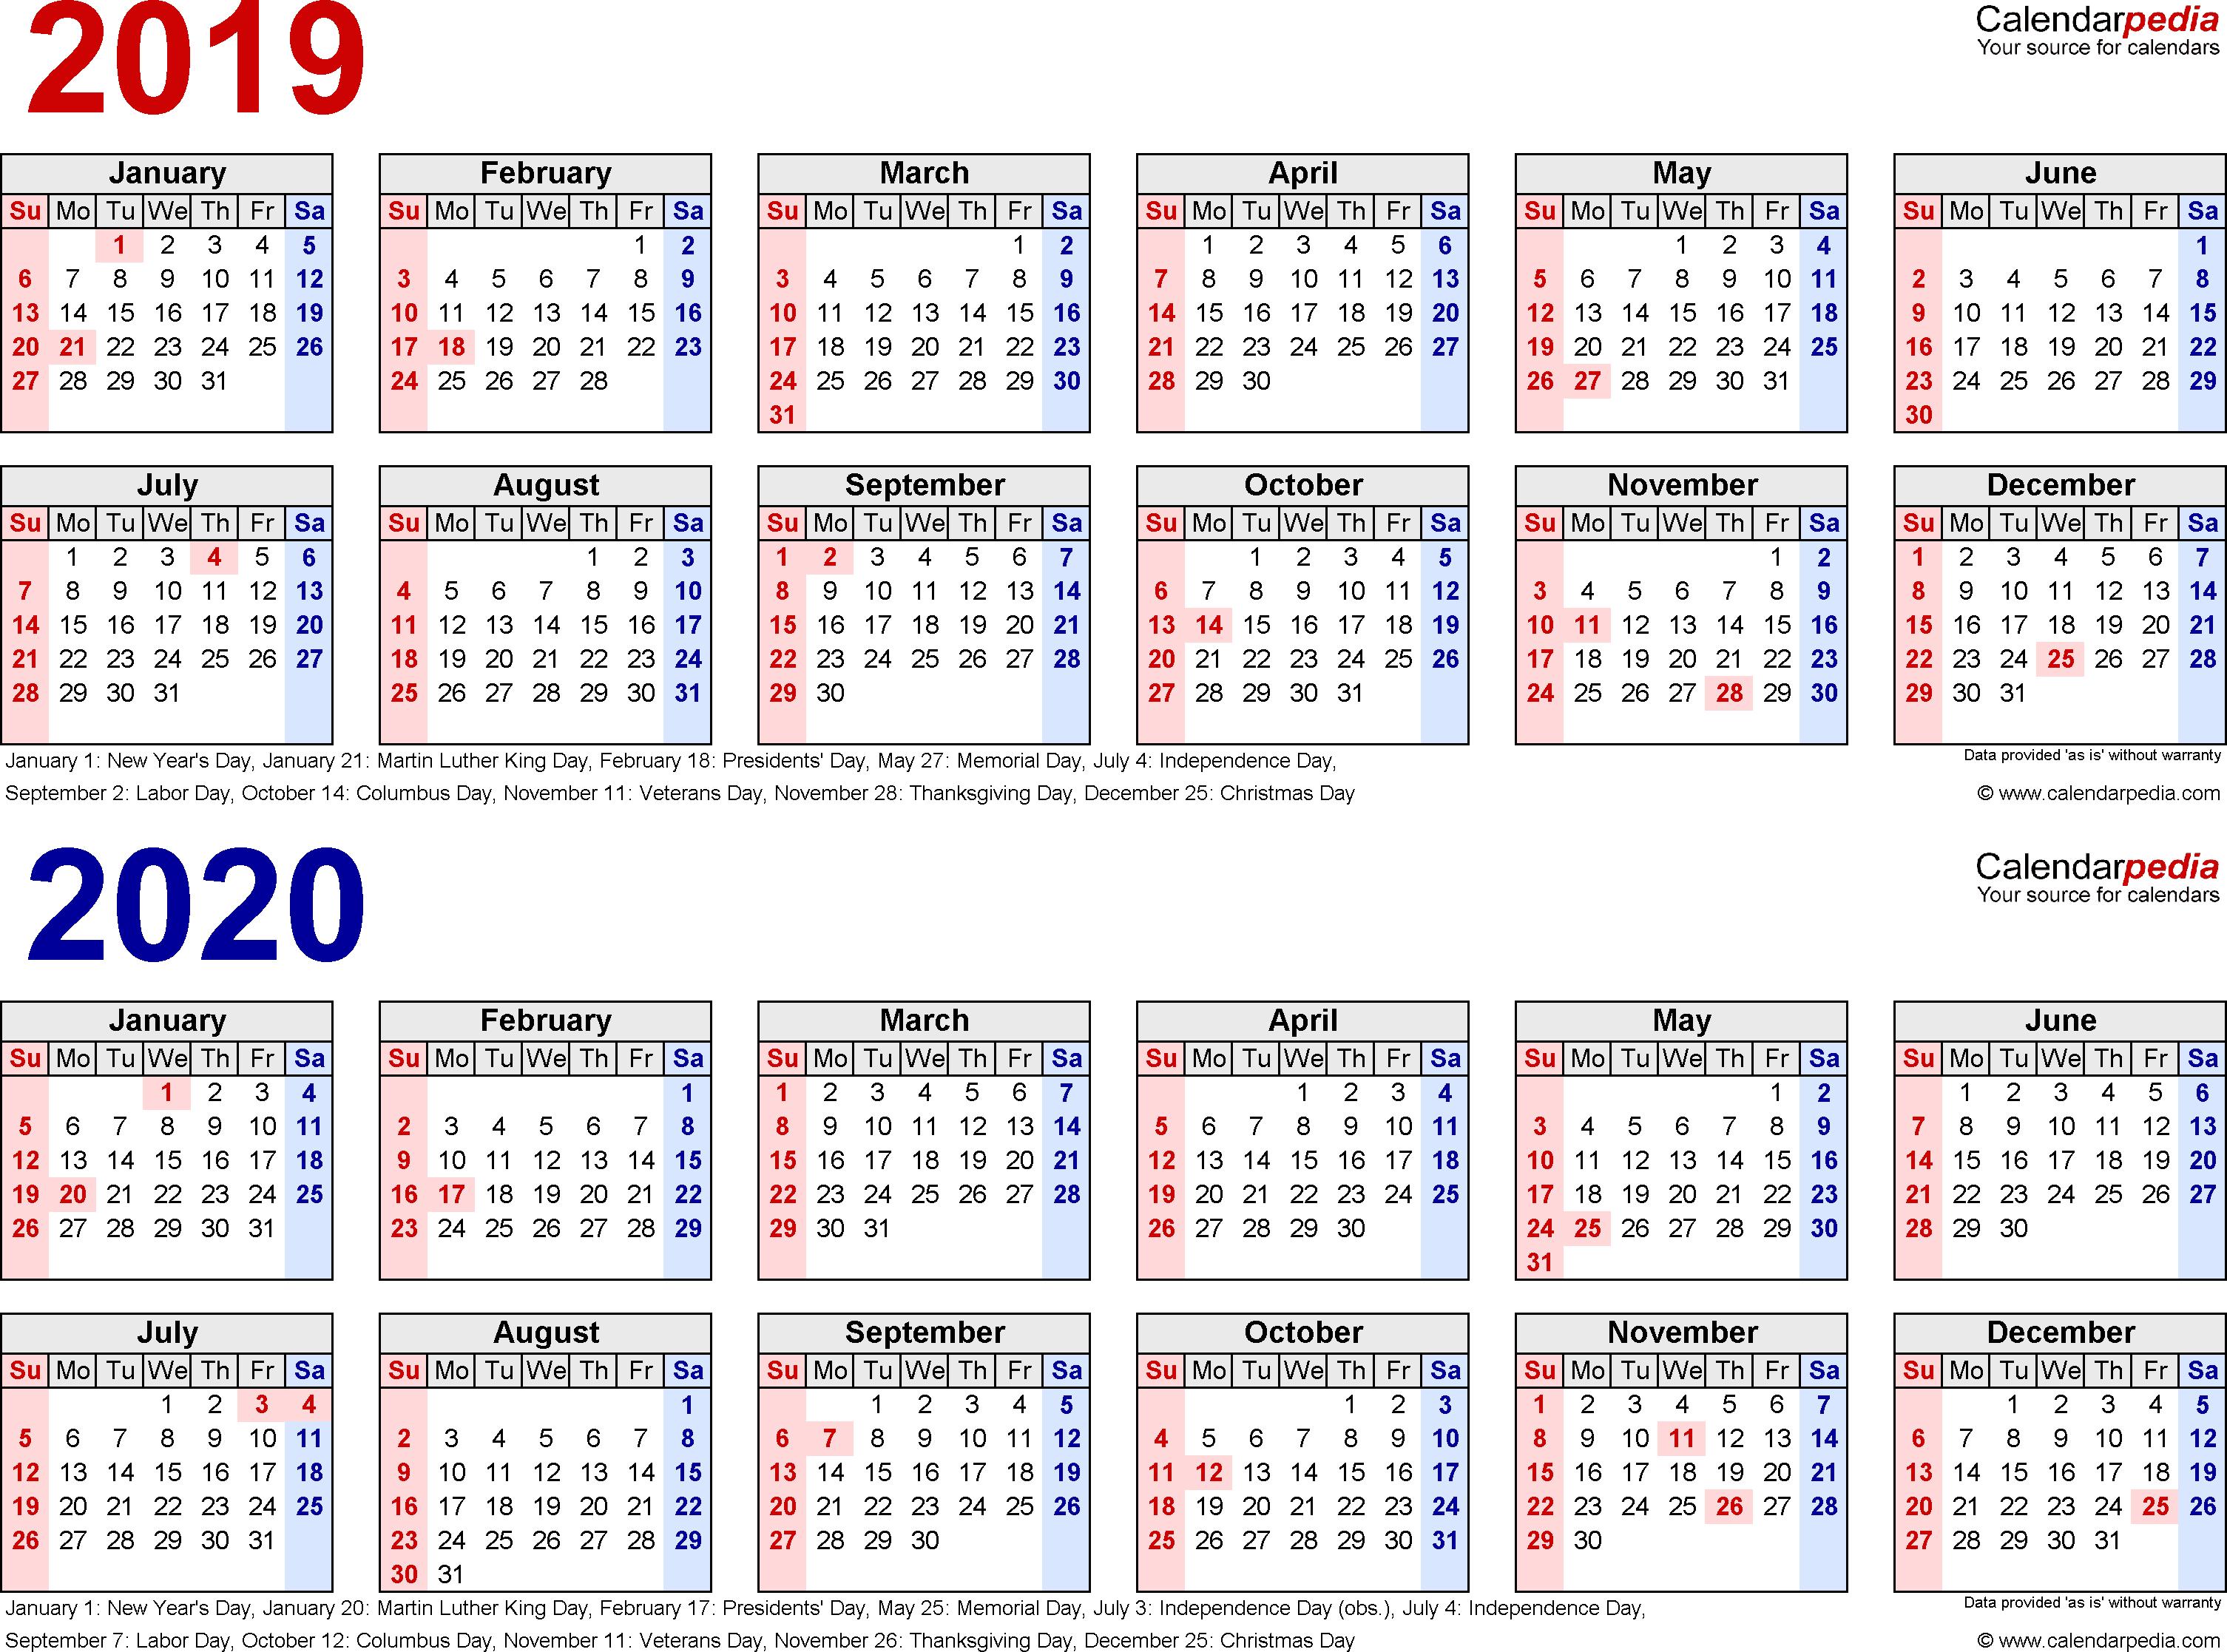 2019-2020 Calendar - Free Printable Two-Year Word Calendars inside Printable Calendar 2019 2020 Write On